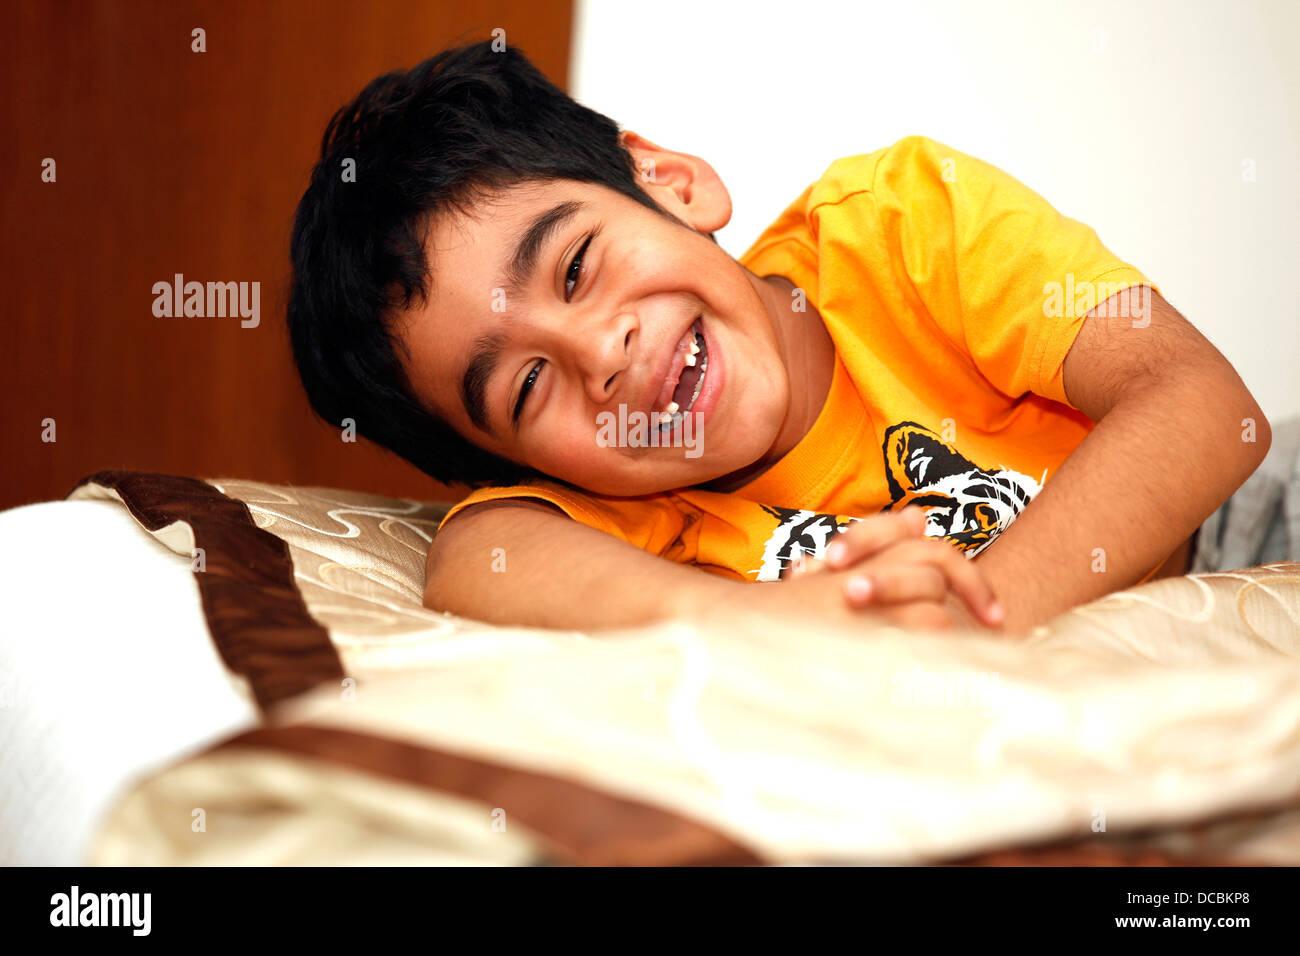 youth,kid,young,child,happy,joyous,Indian,missing teeth,broken teeth,cheerful - Stock Image